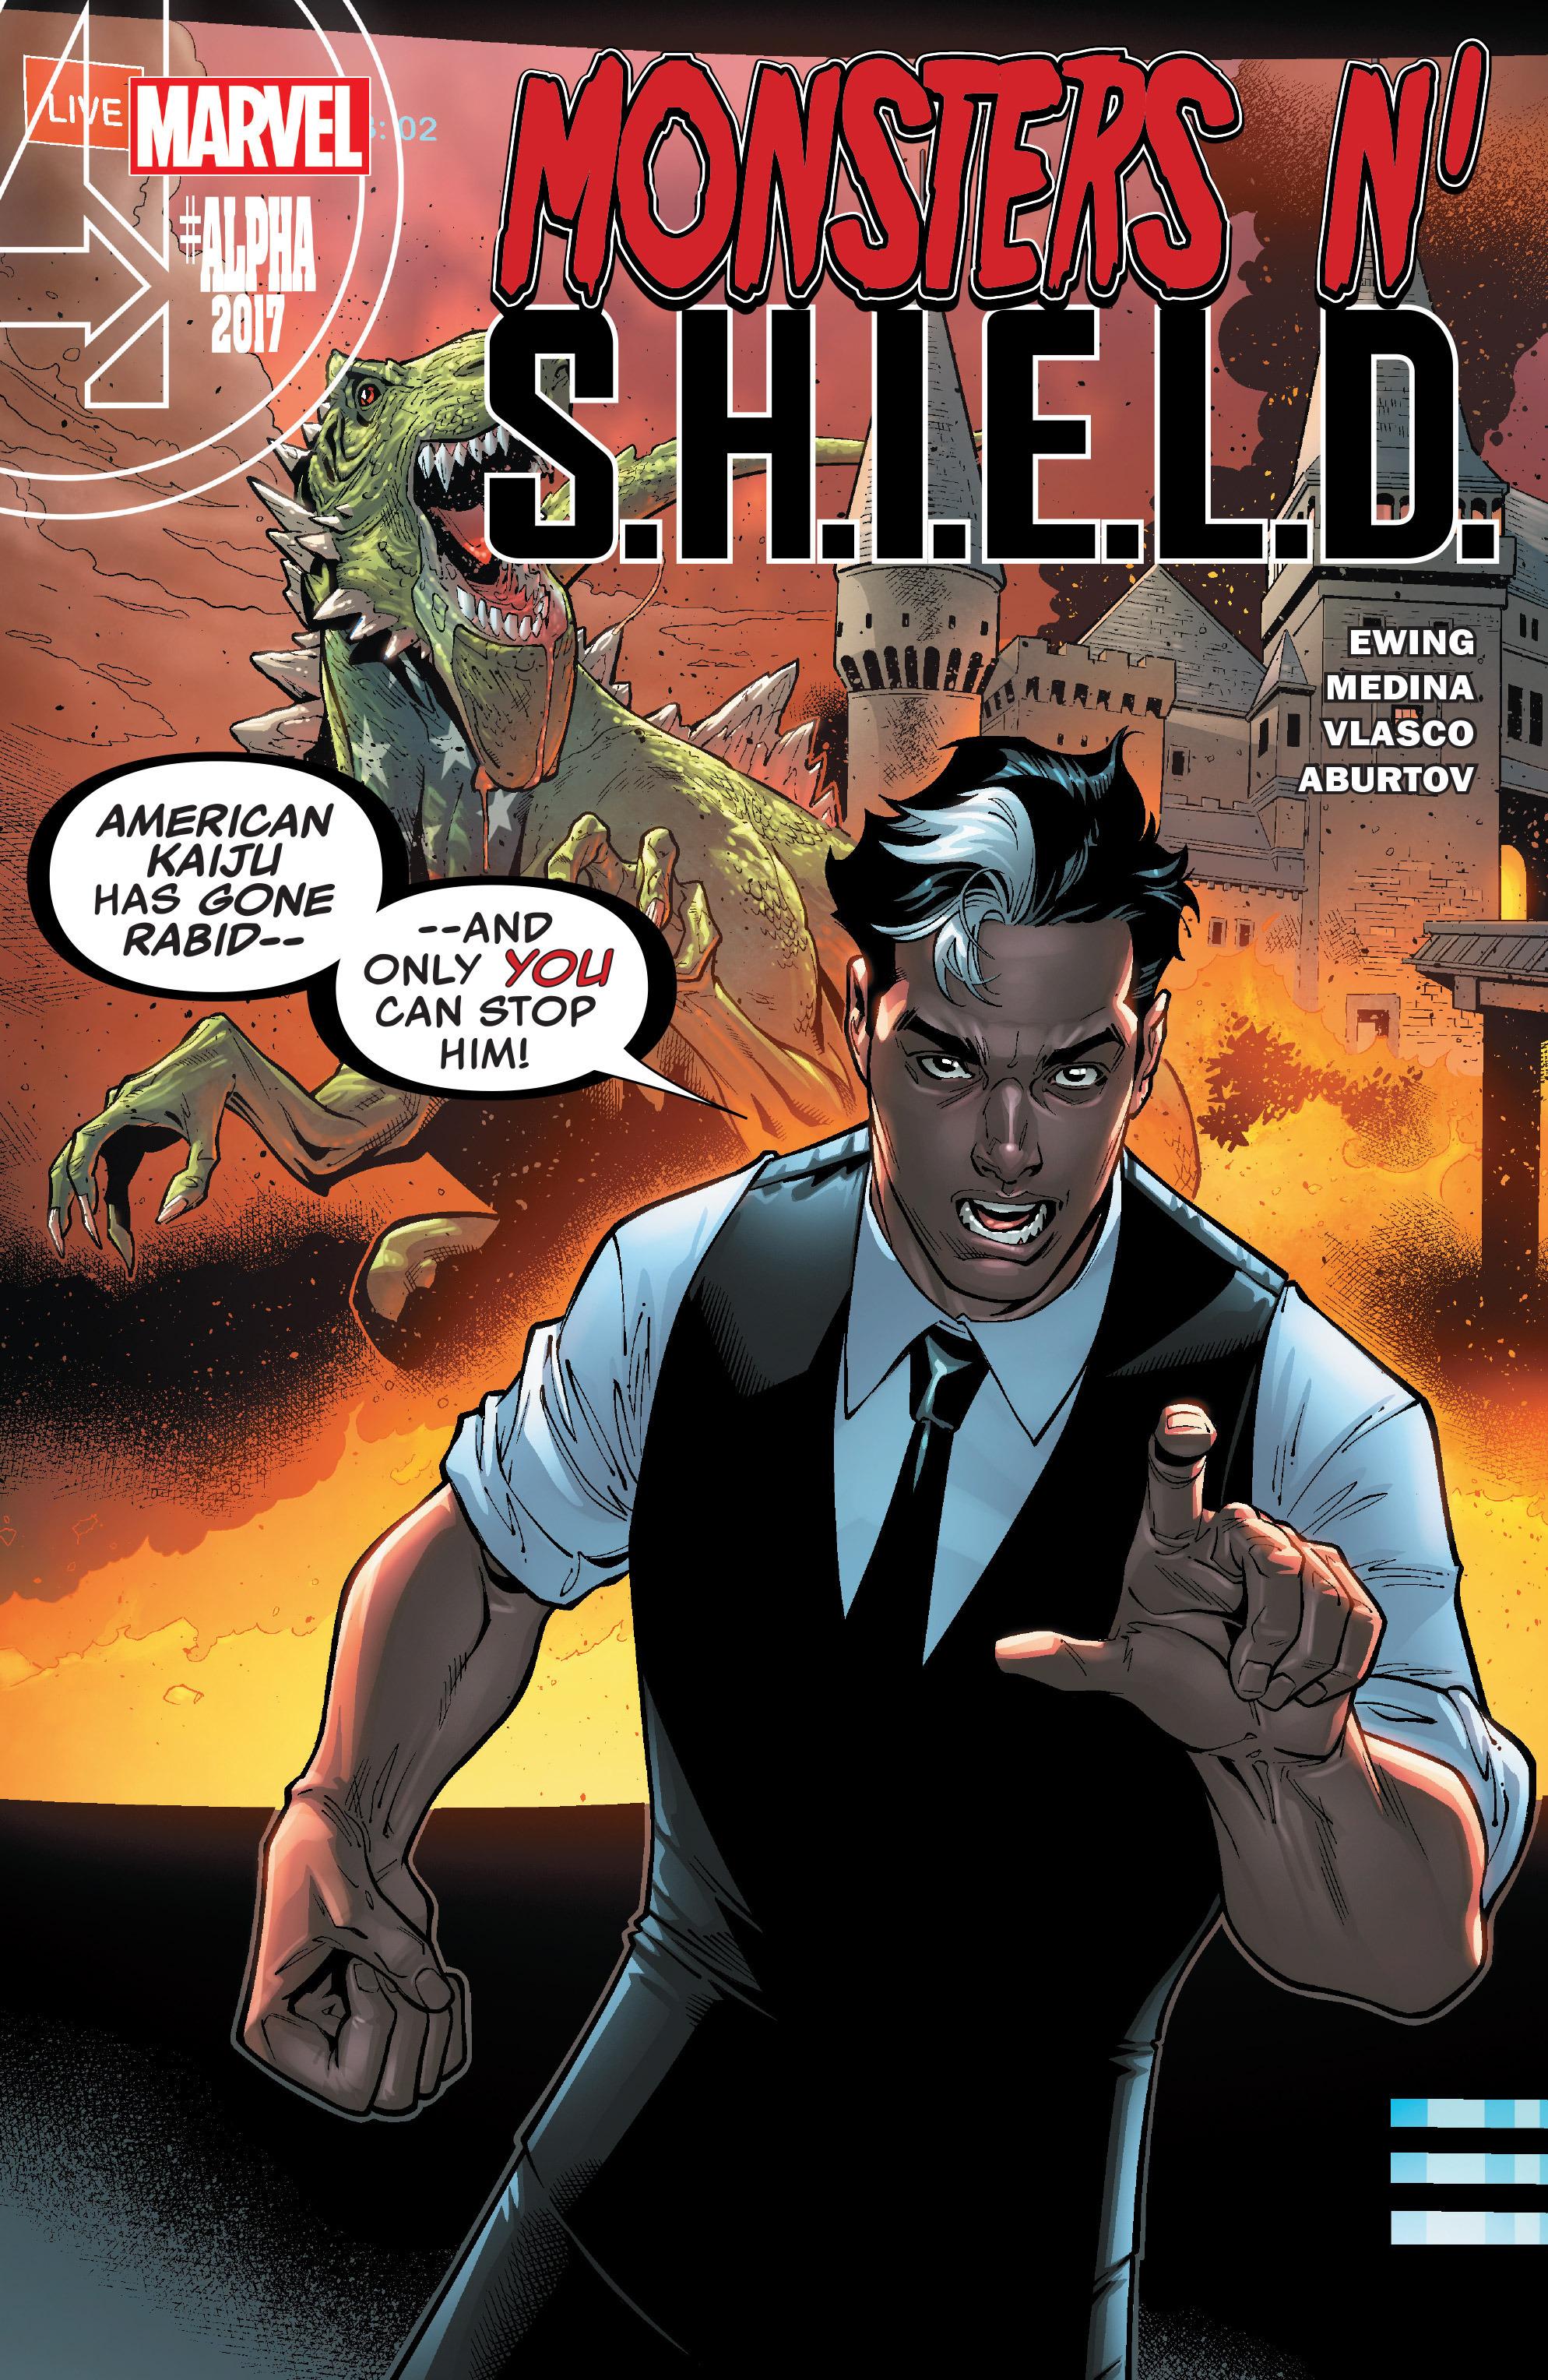 Read online U.S.Avengers comic -  Issue #4 - 3